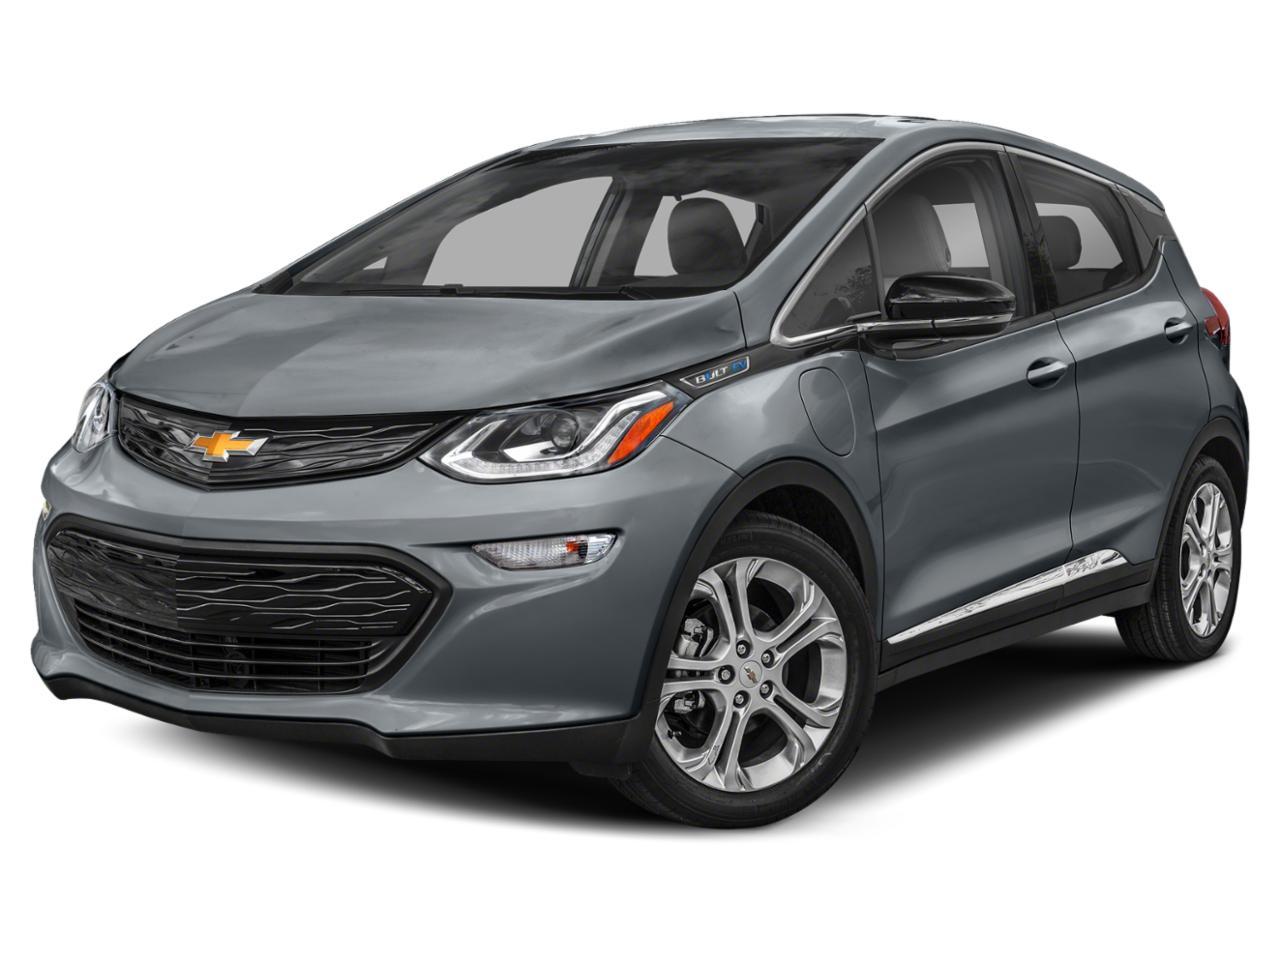 Gray Metallic 2020 Chevrolet Bolt EV PREMIER Station Wagon Lexington NC